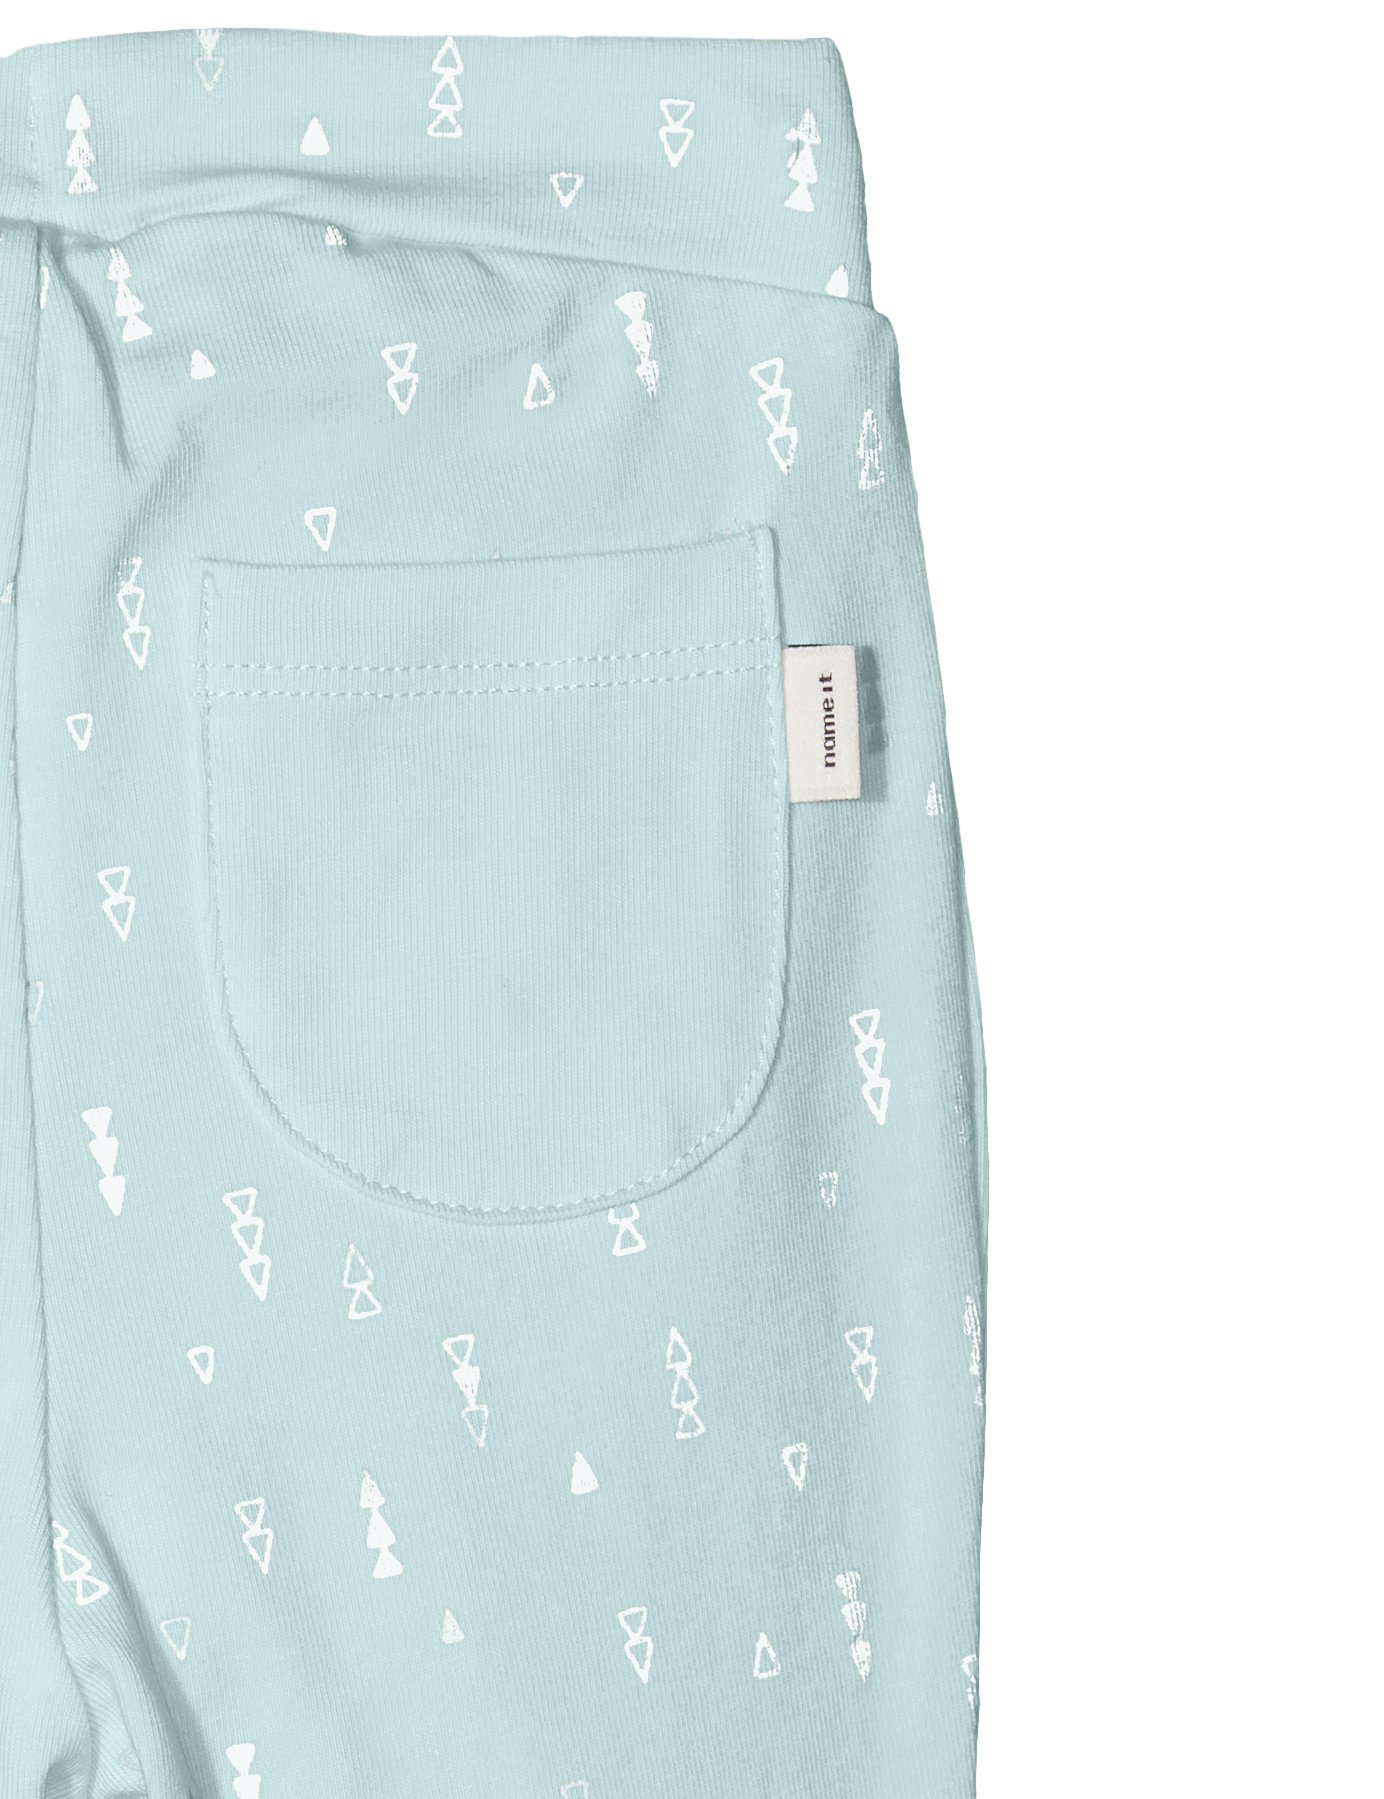 NAME IT Nbndelucious Pant Noos Pantalones para Bebés 4